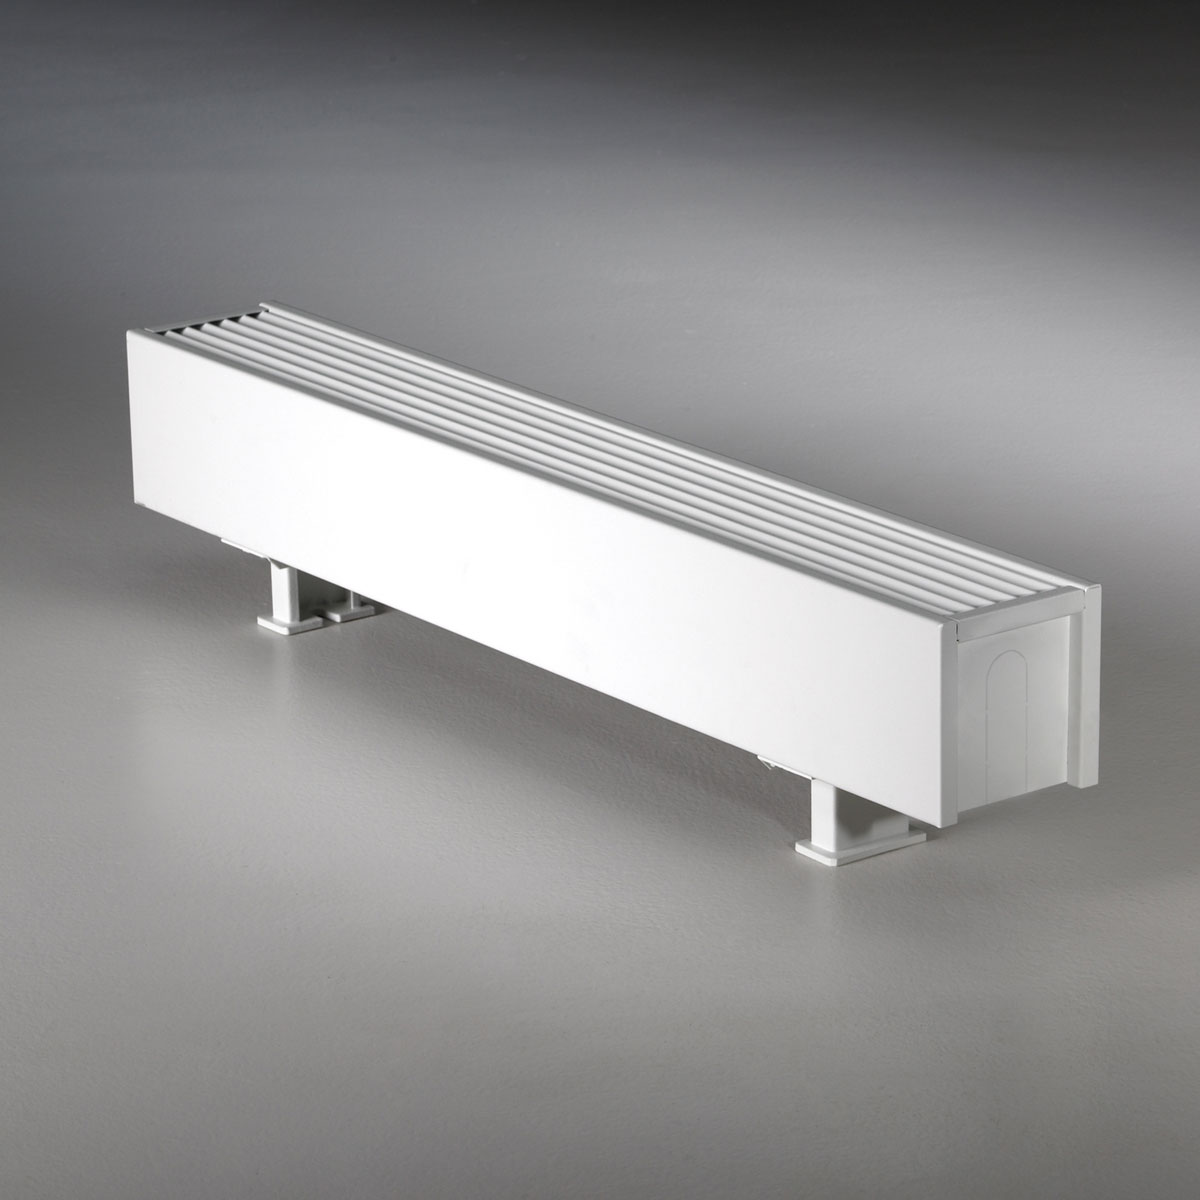 mini radiator heater mini free engine image for user. Black Bedroom Furniture Sets. Home Design Ideas